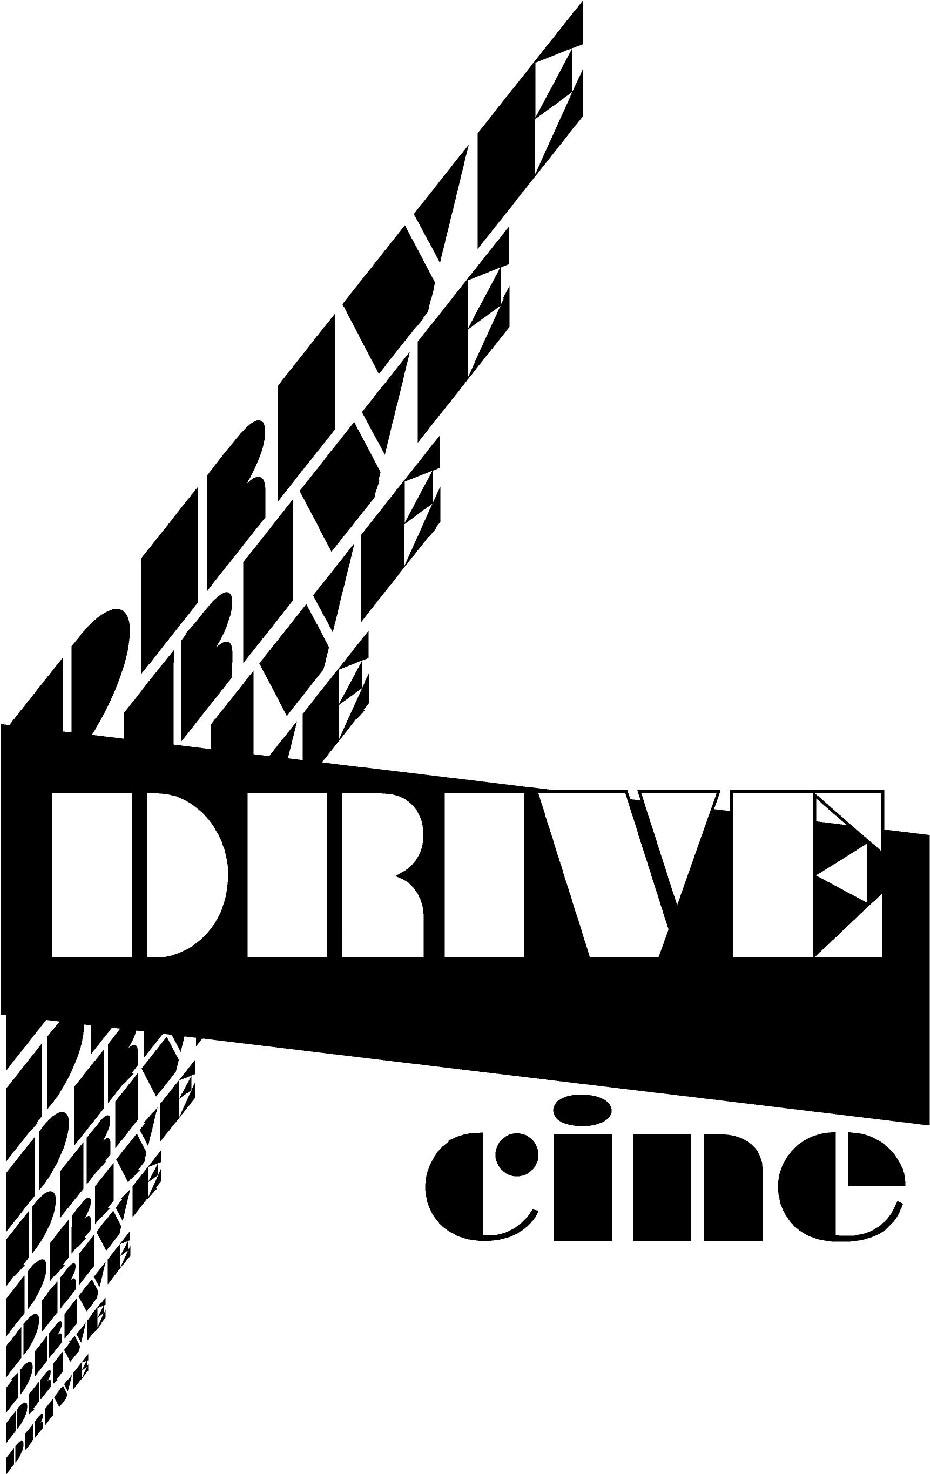 DRIVE cine